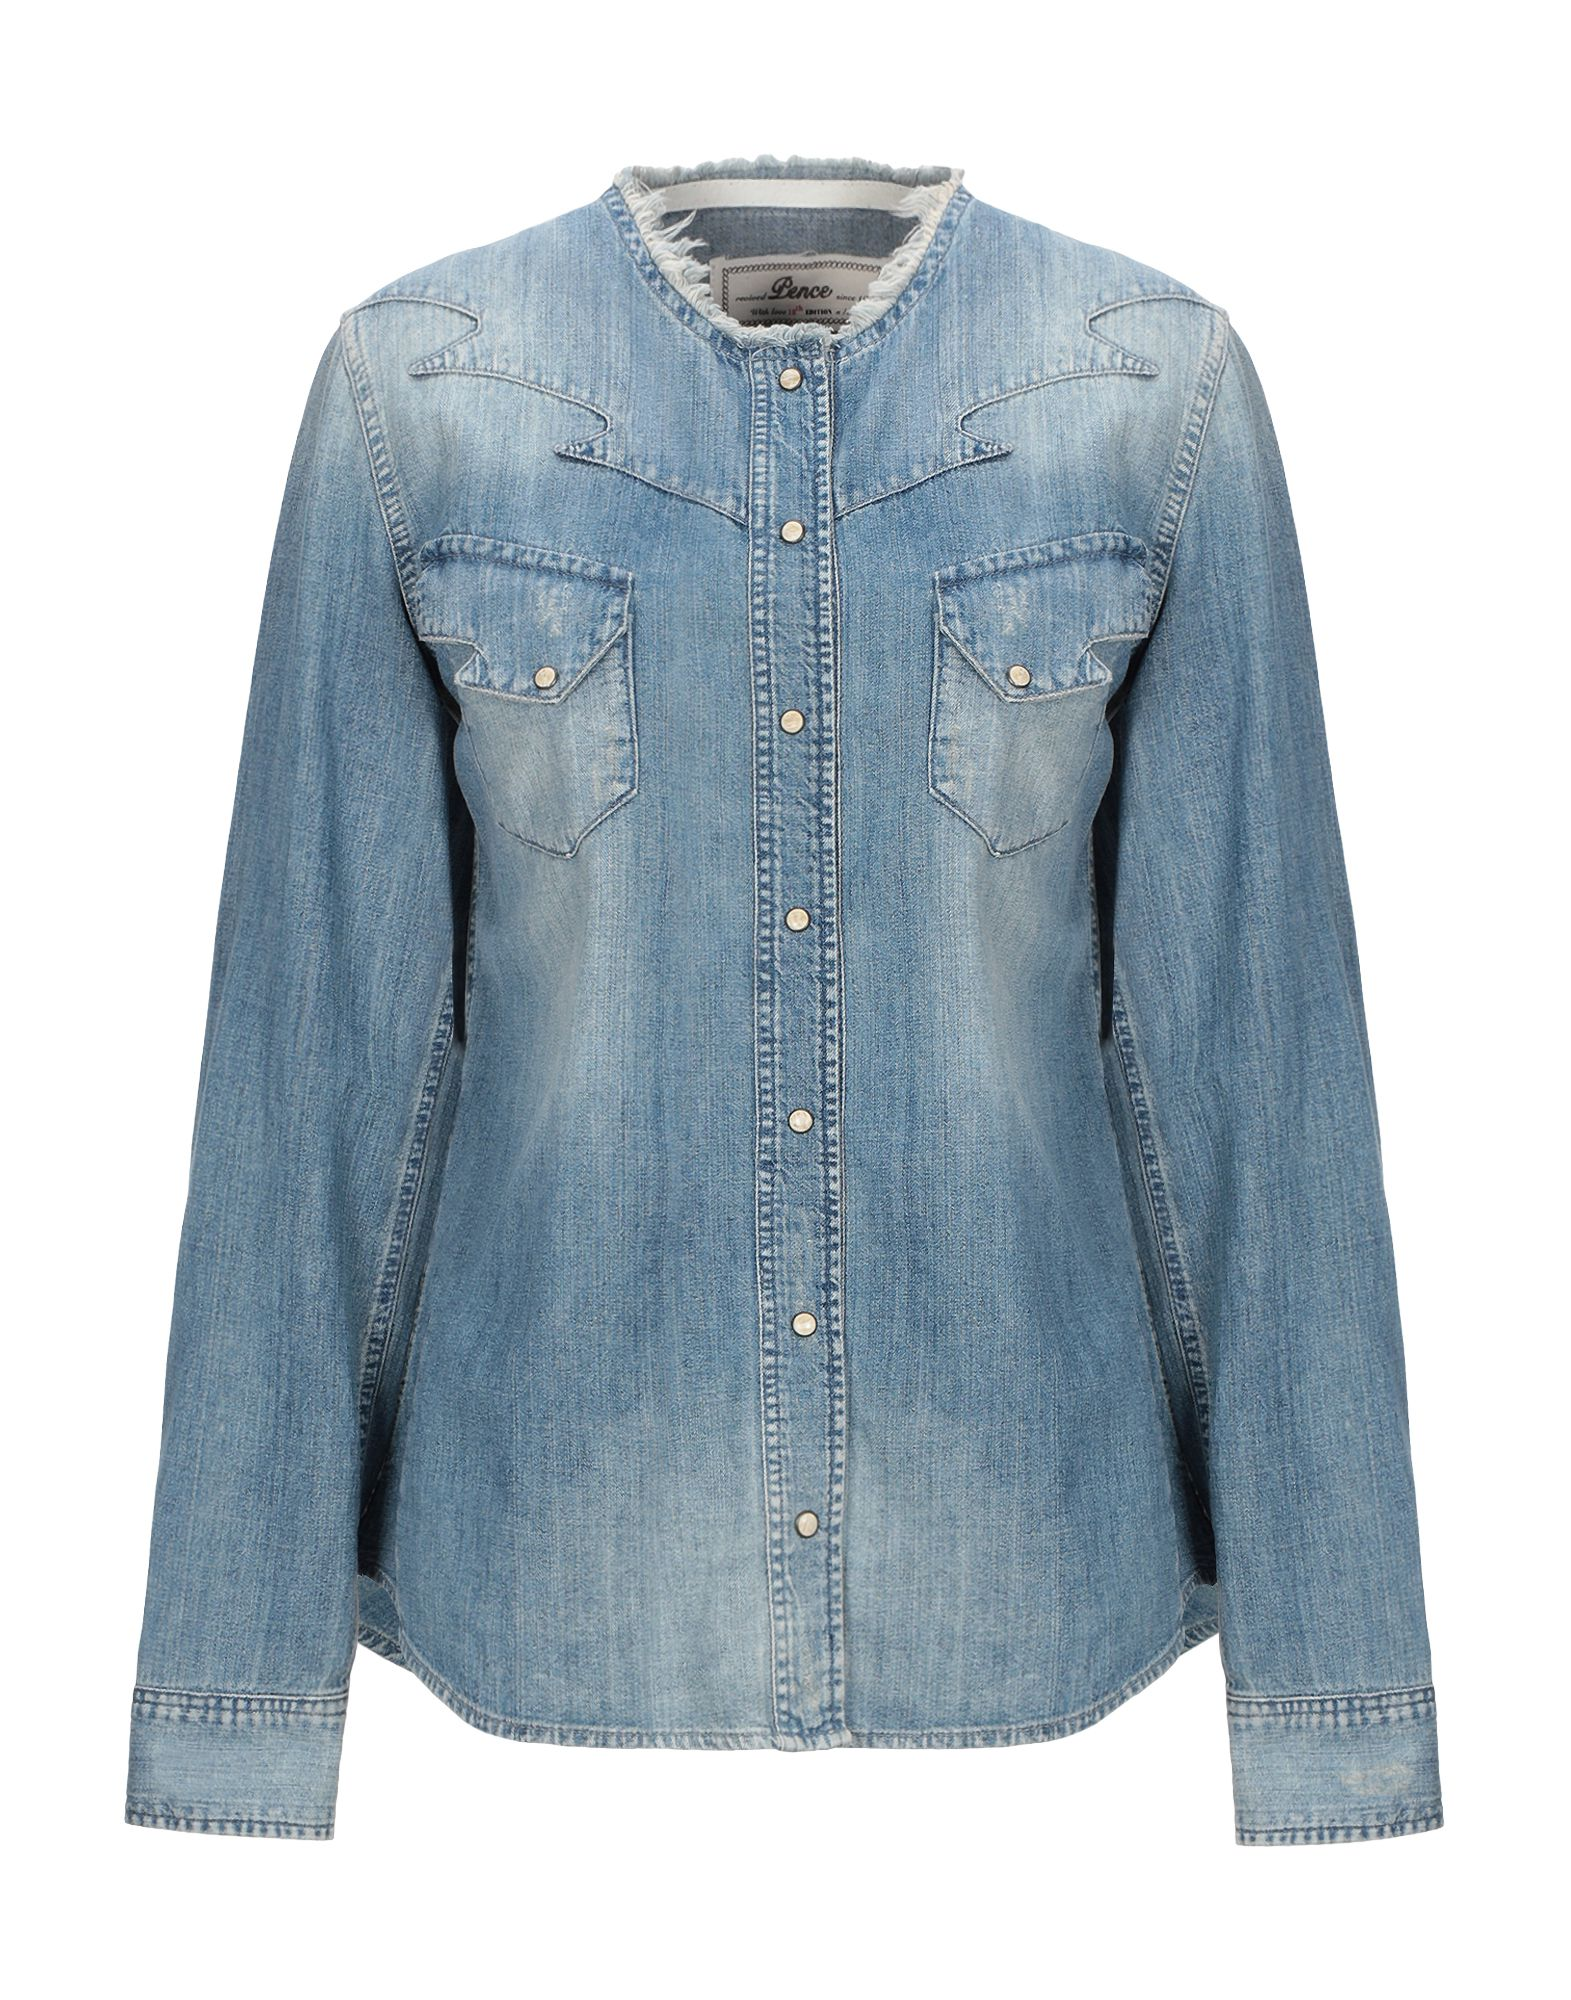 PENCE Джинсовая рубашка pence джинсовая рубашка